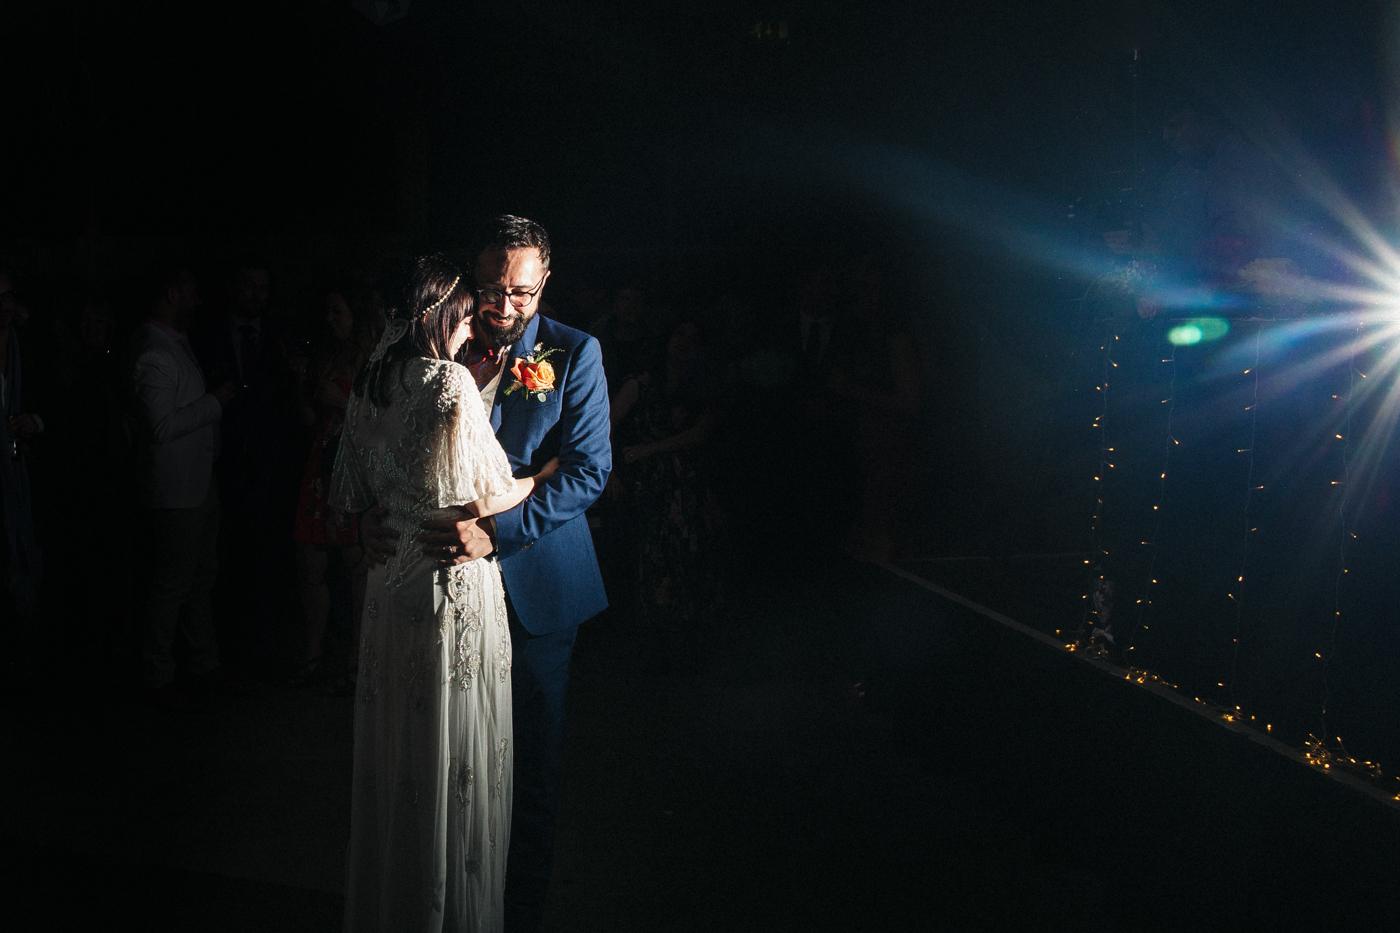 teesside-middlesbrough-north-east-wedding-photographer-creative-wedding-venues-0104.jpg